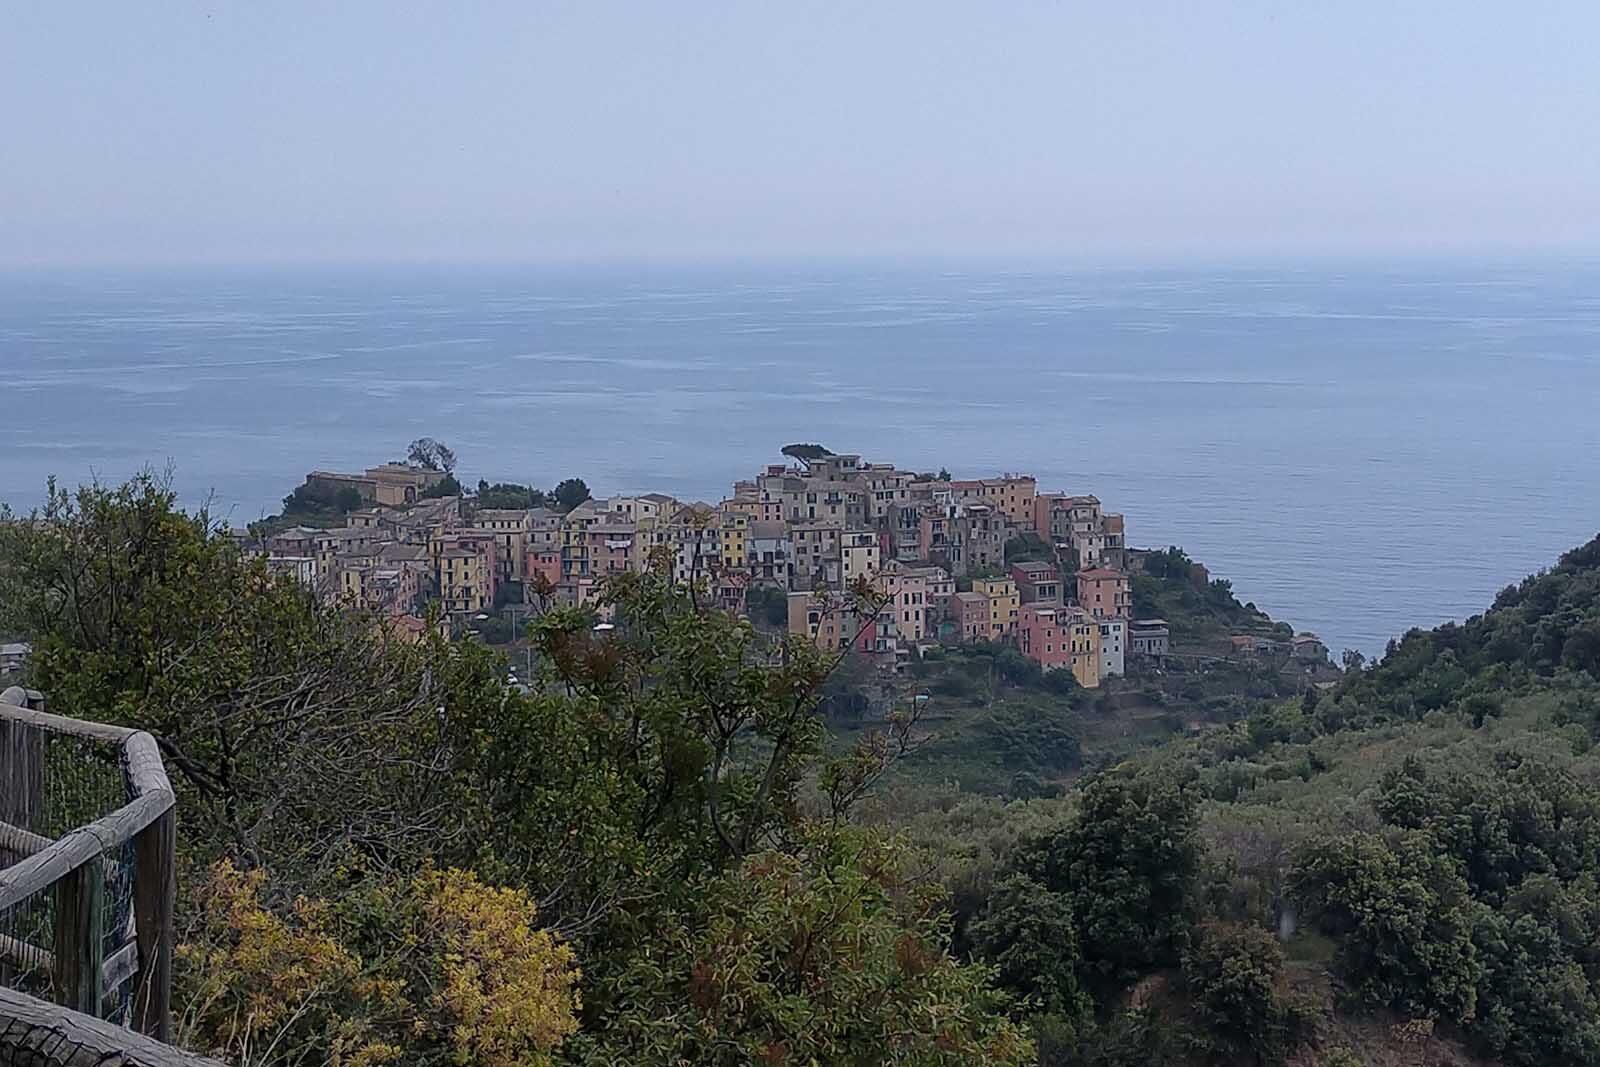 Dieses Bild hat ein leeres Alt-Attribut. Der Dateiname ist 046-Italien-2021-La-Spezia_Corniglia-cinque-terre-1600x1067.jpg